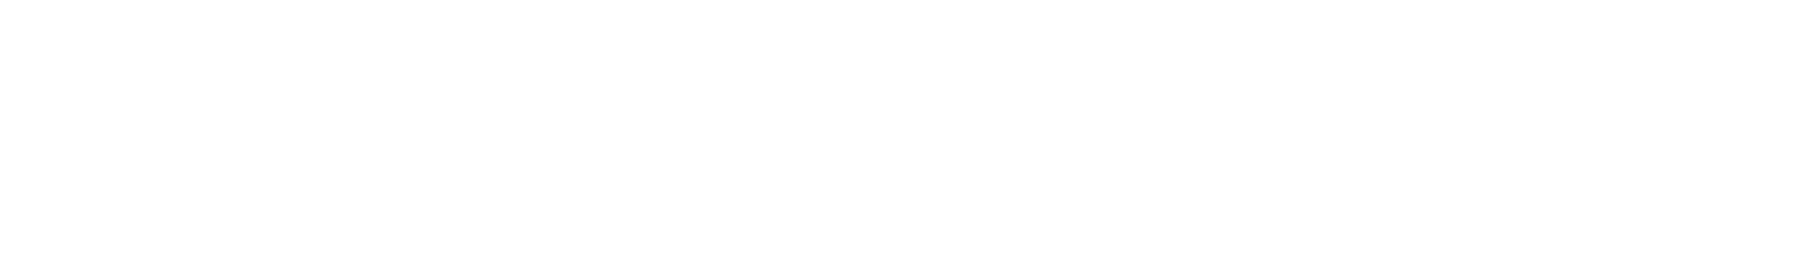 g abs05 079